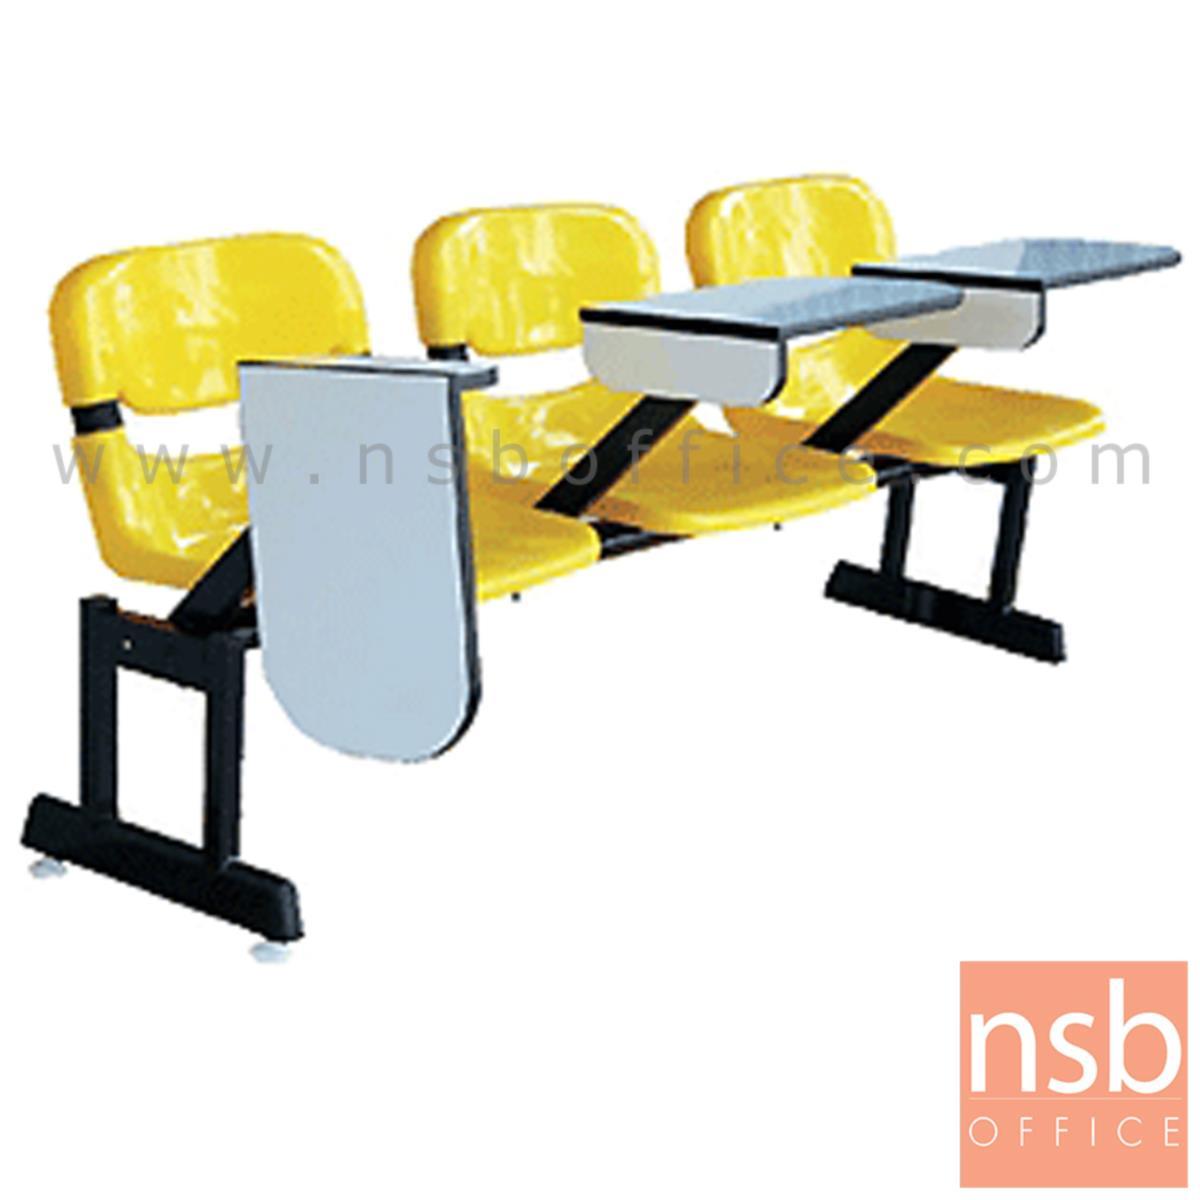 B17A036:เก้าอี้เลคเชอร์แถวเฟรมโพลี่ รุ่น POLY-002 3 และ 4 ที่นั่ง ขาเหล็กเหลี่ยมแบบขาคู่พ่นดำ